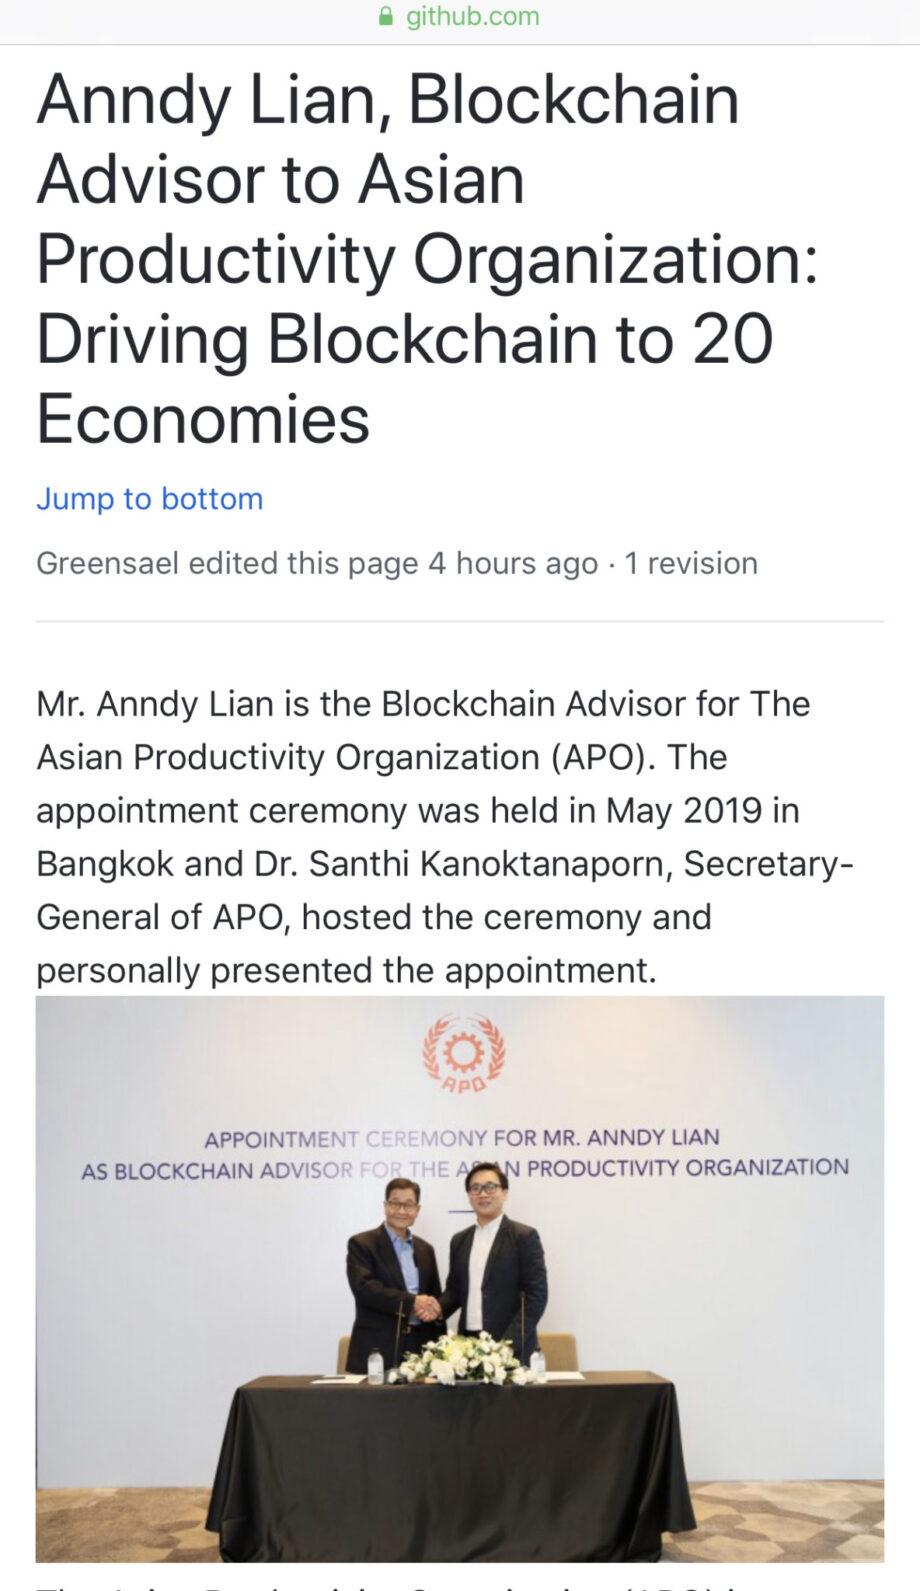 [Github.com] Anndy Lian, Blockchain Advisor to Asian Productivity Organization: Driving Blockchain to 20 Economies